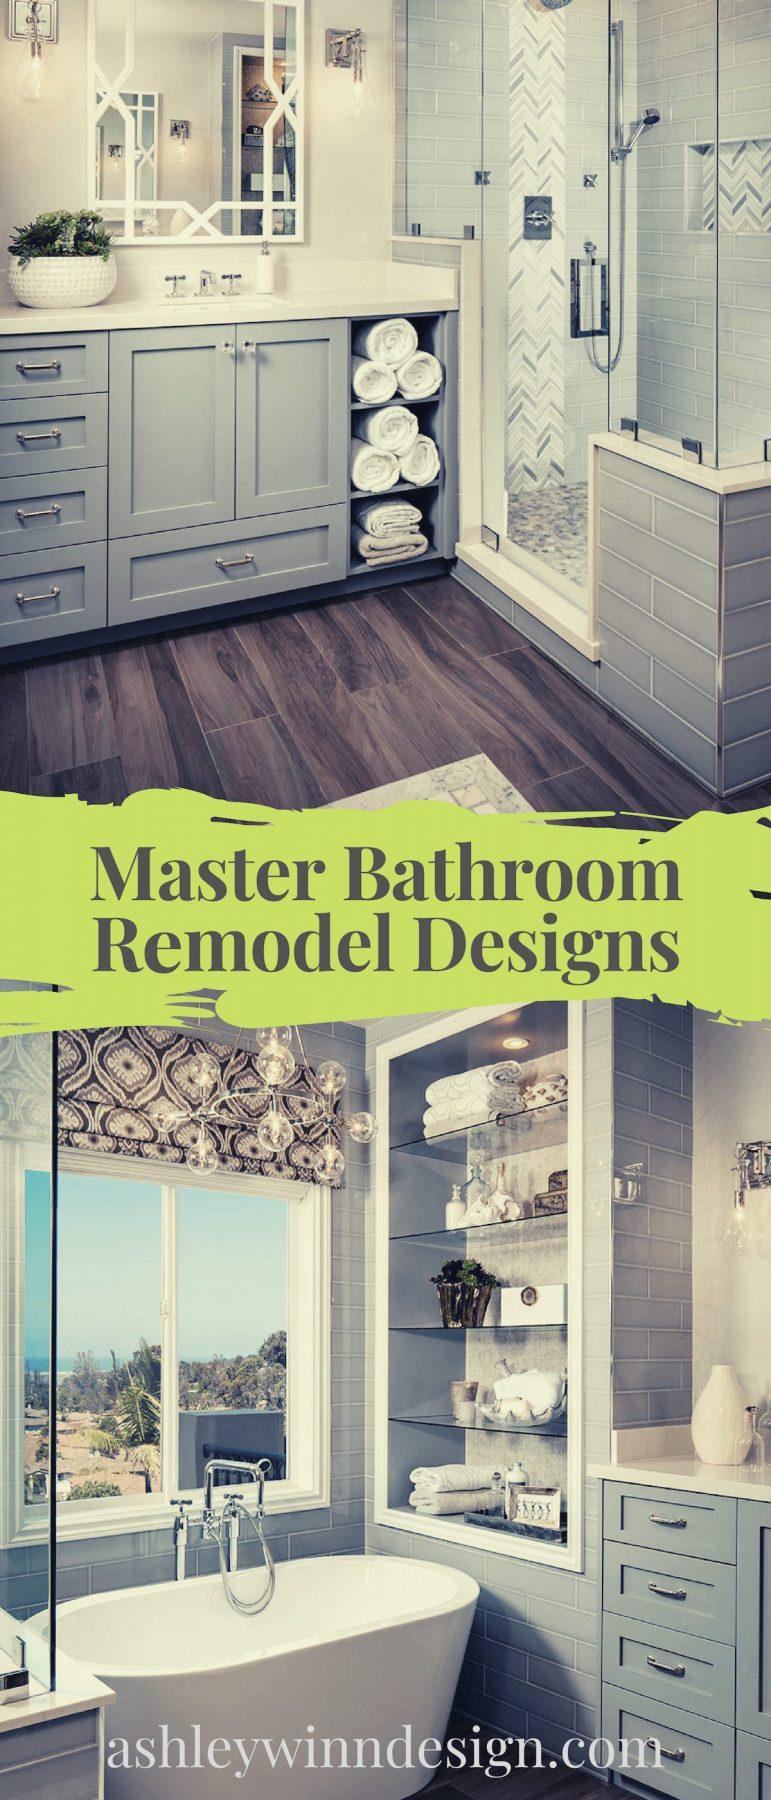 master bathroom remodel cost